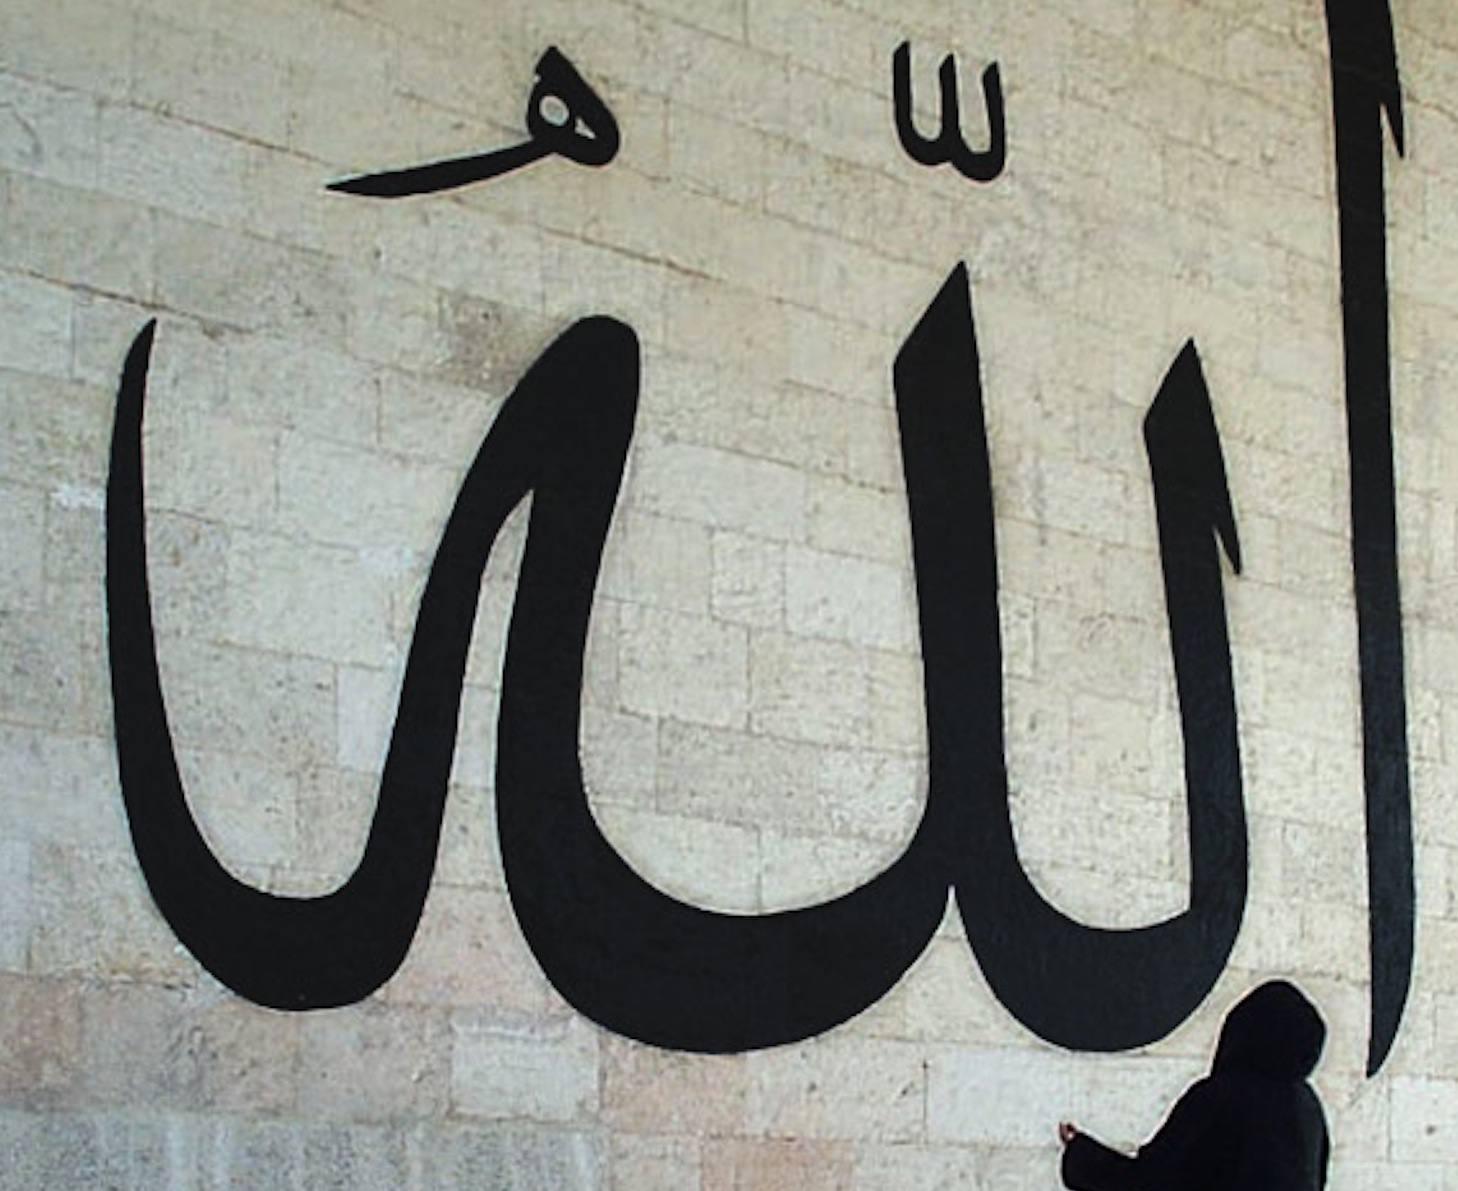 Allah script outside Eski Cami (The Old Mosque) in Edirne, Turkey.